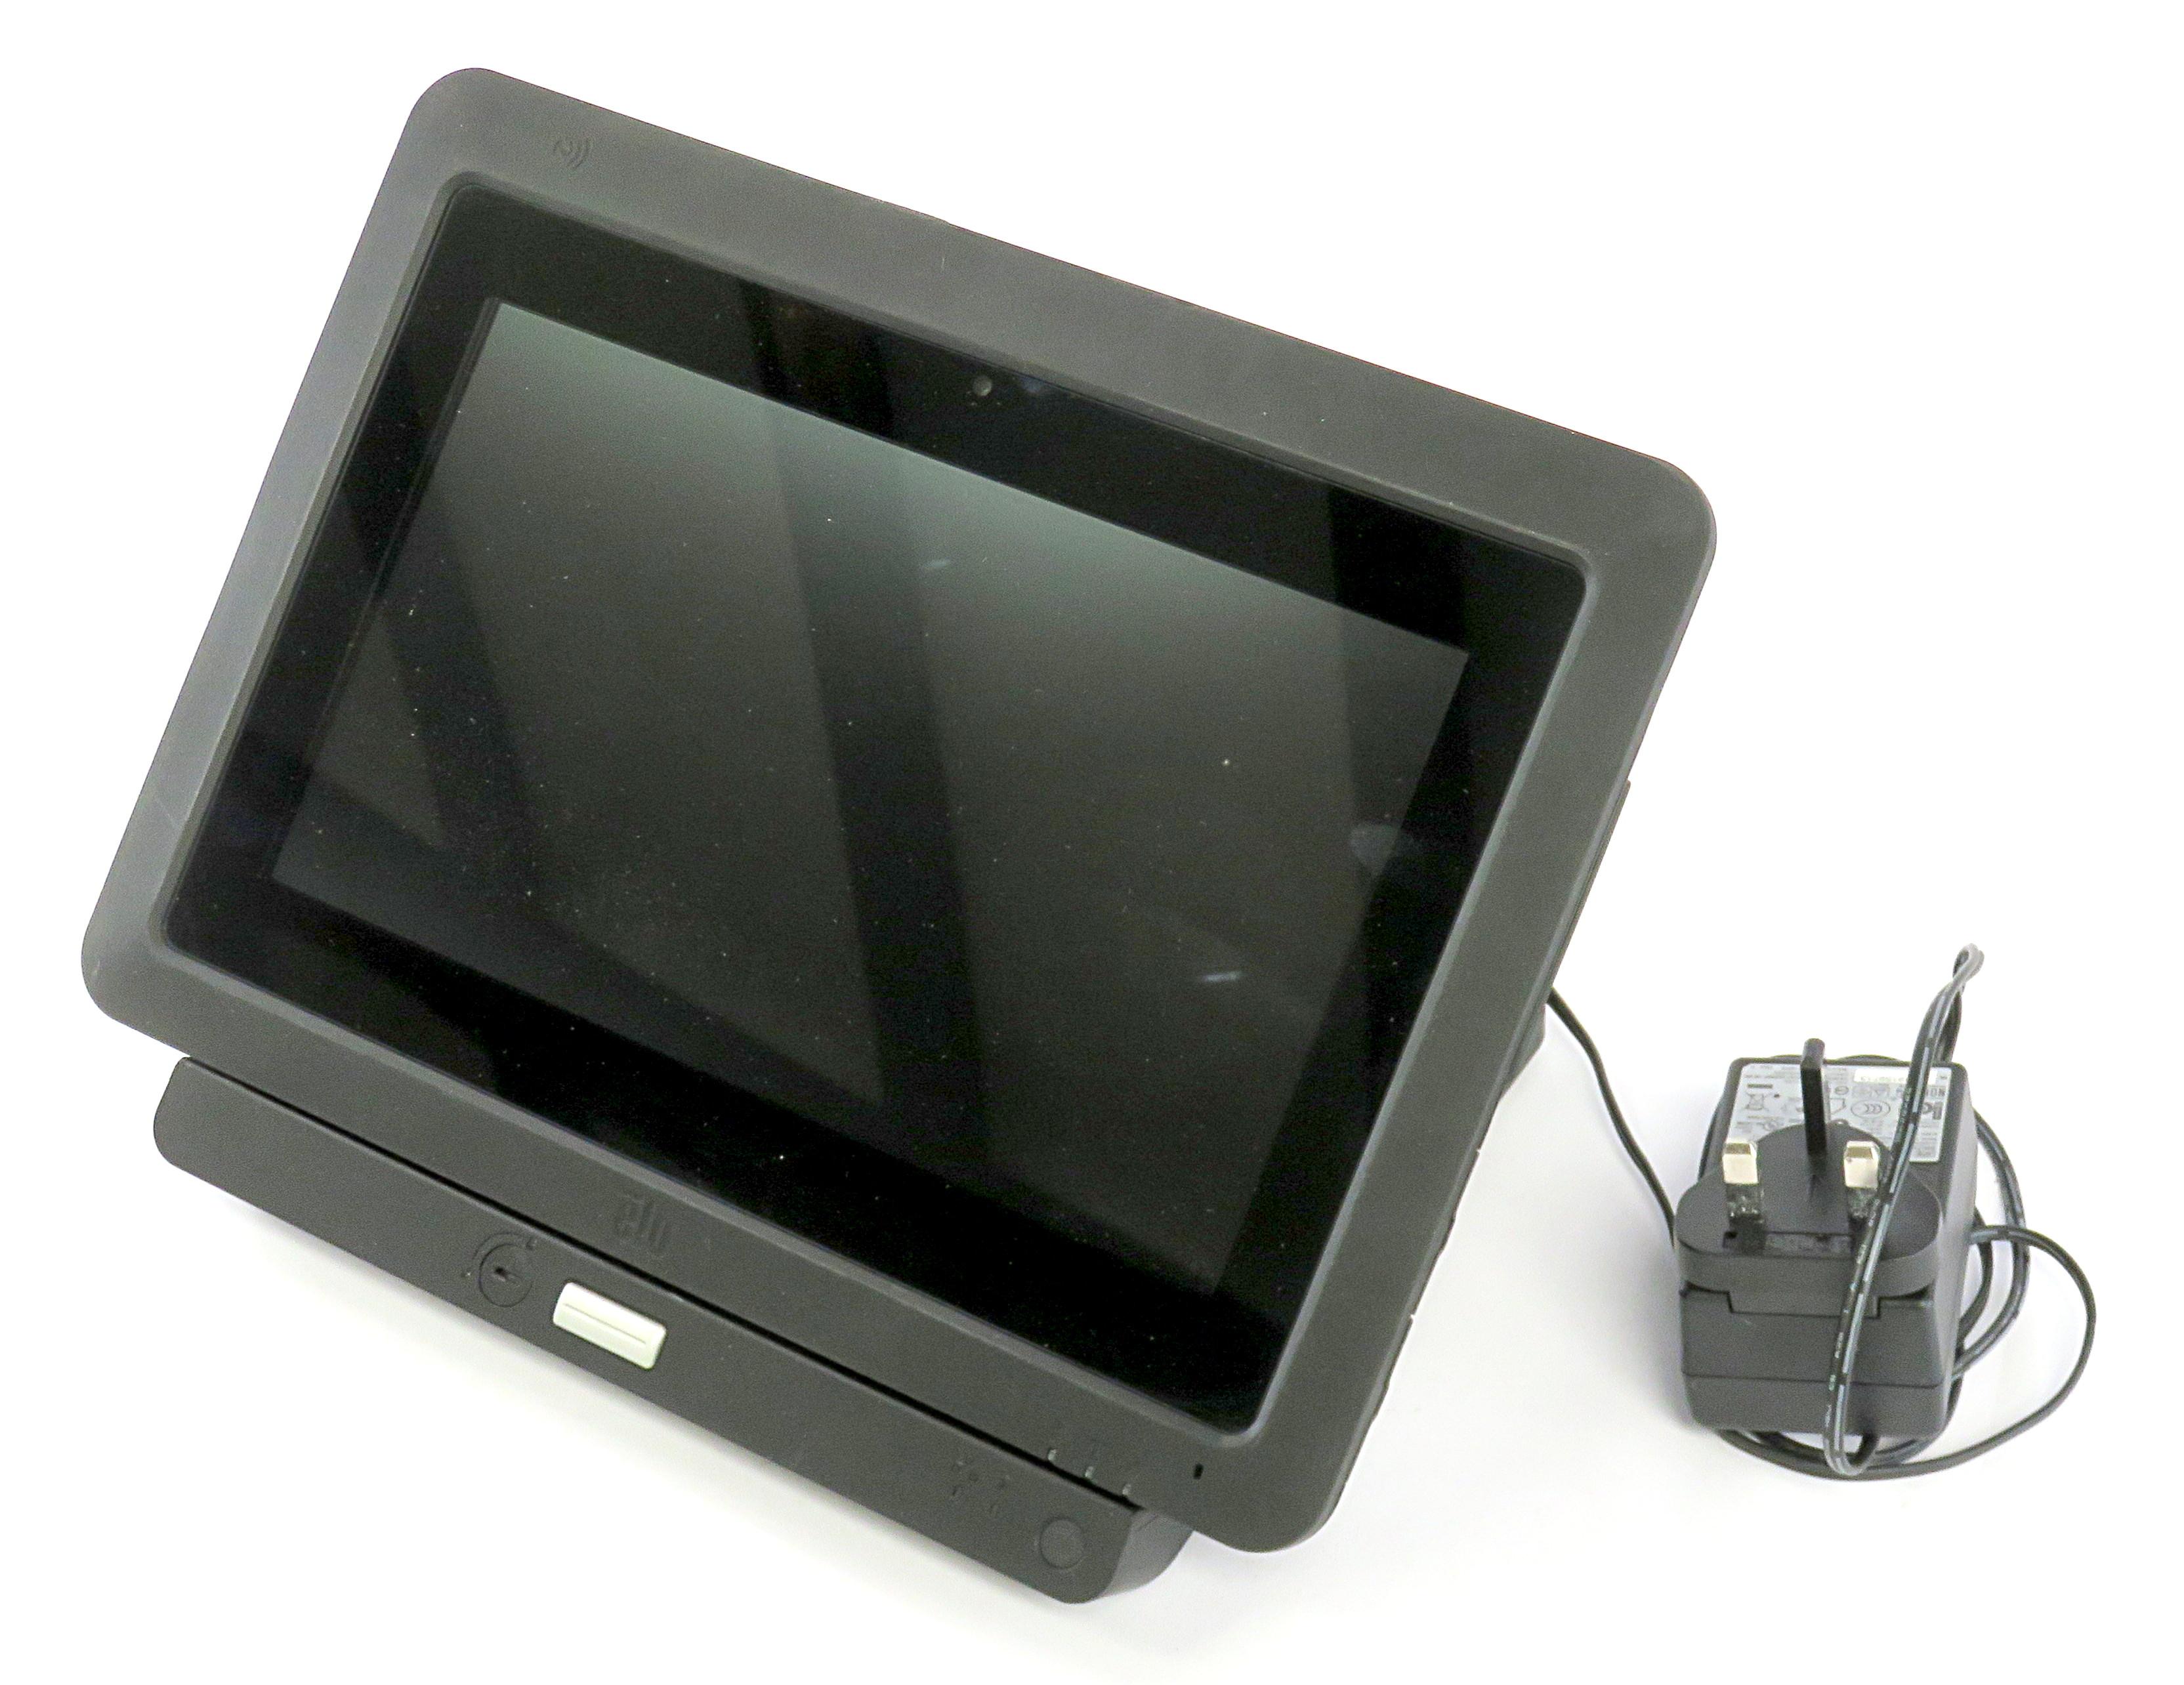 Elo Tablet ETT10A1 Rugged EPOS Tablet w/ Docking Station E518383 & PSU